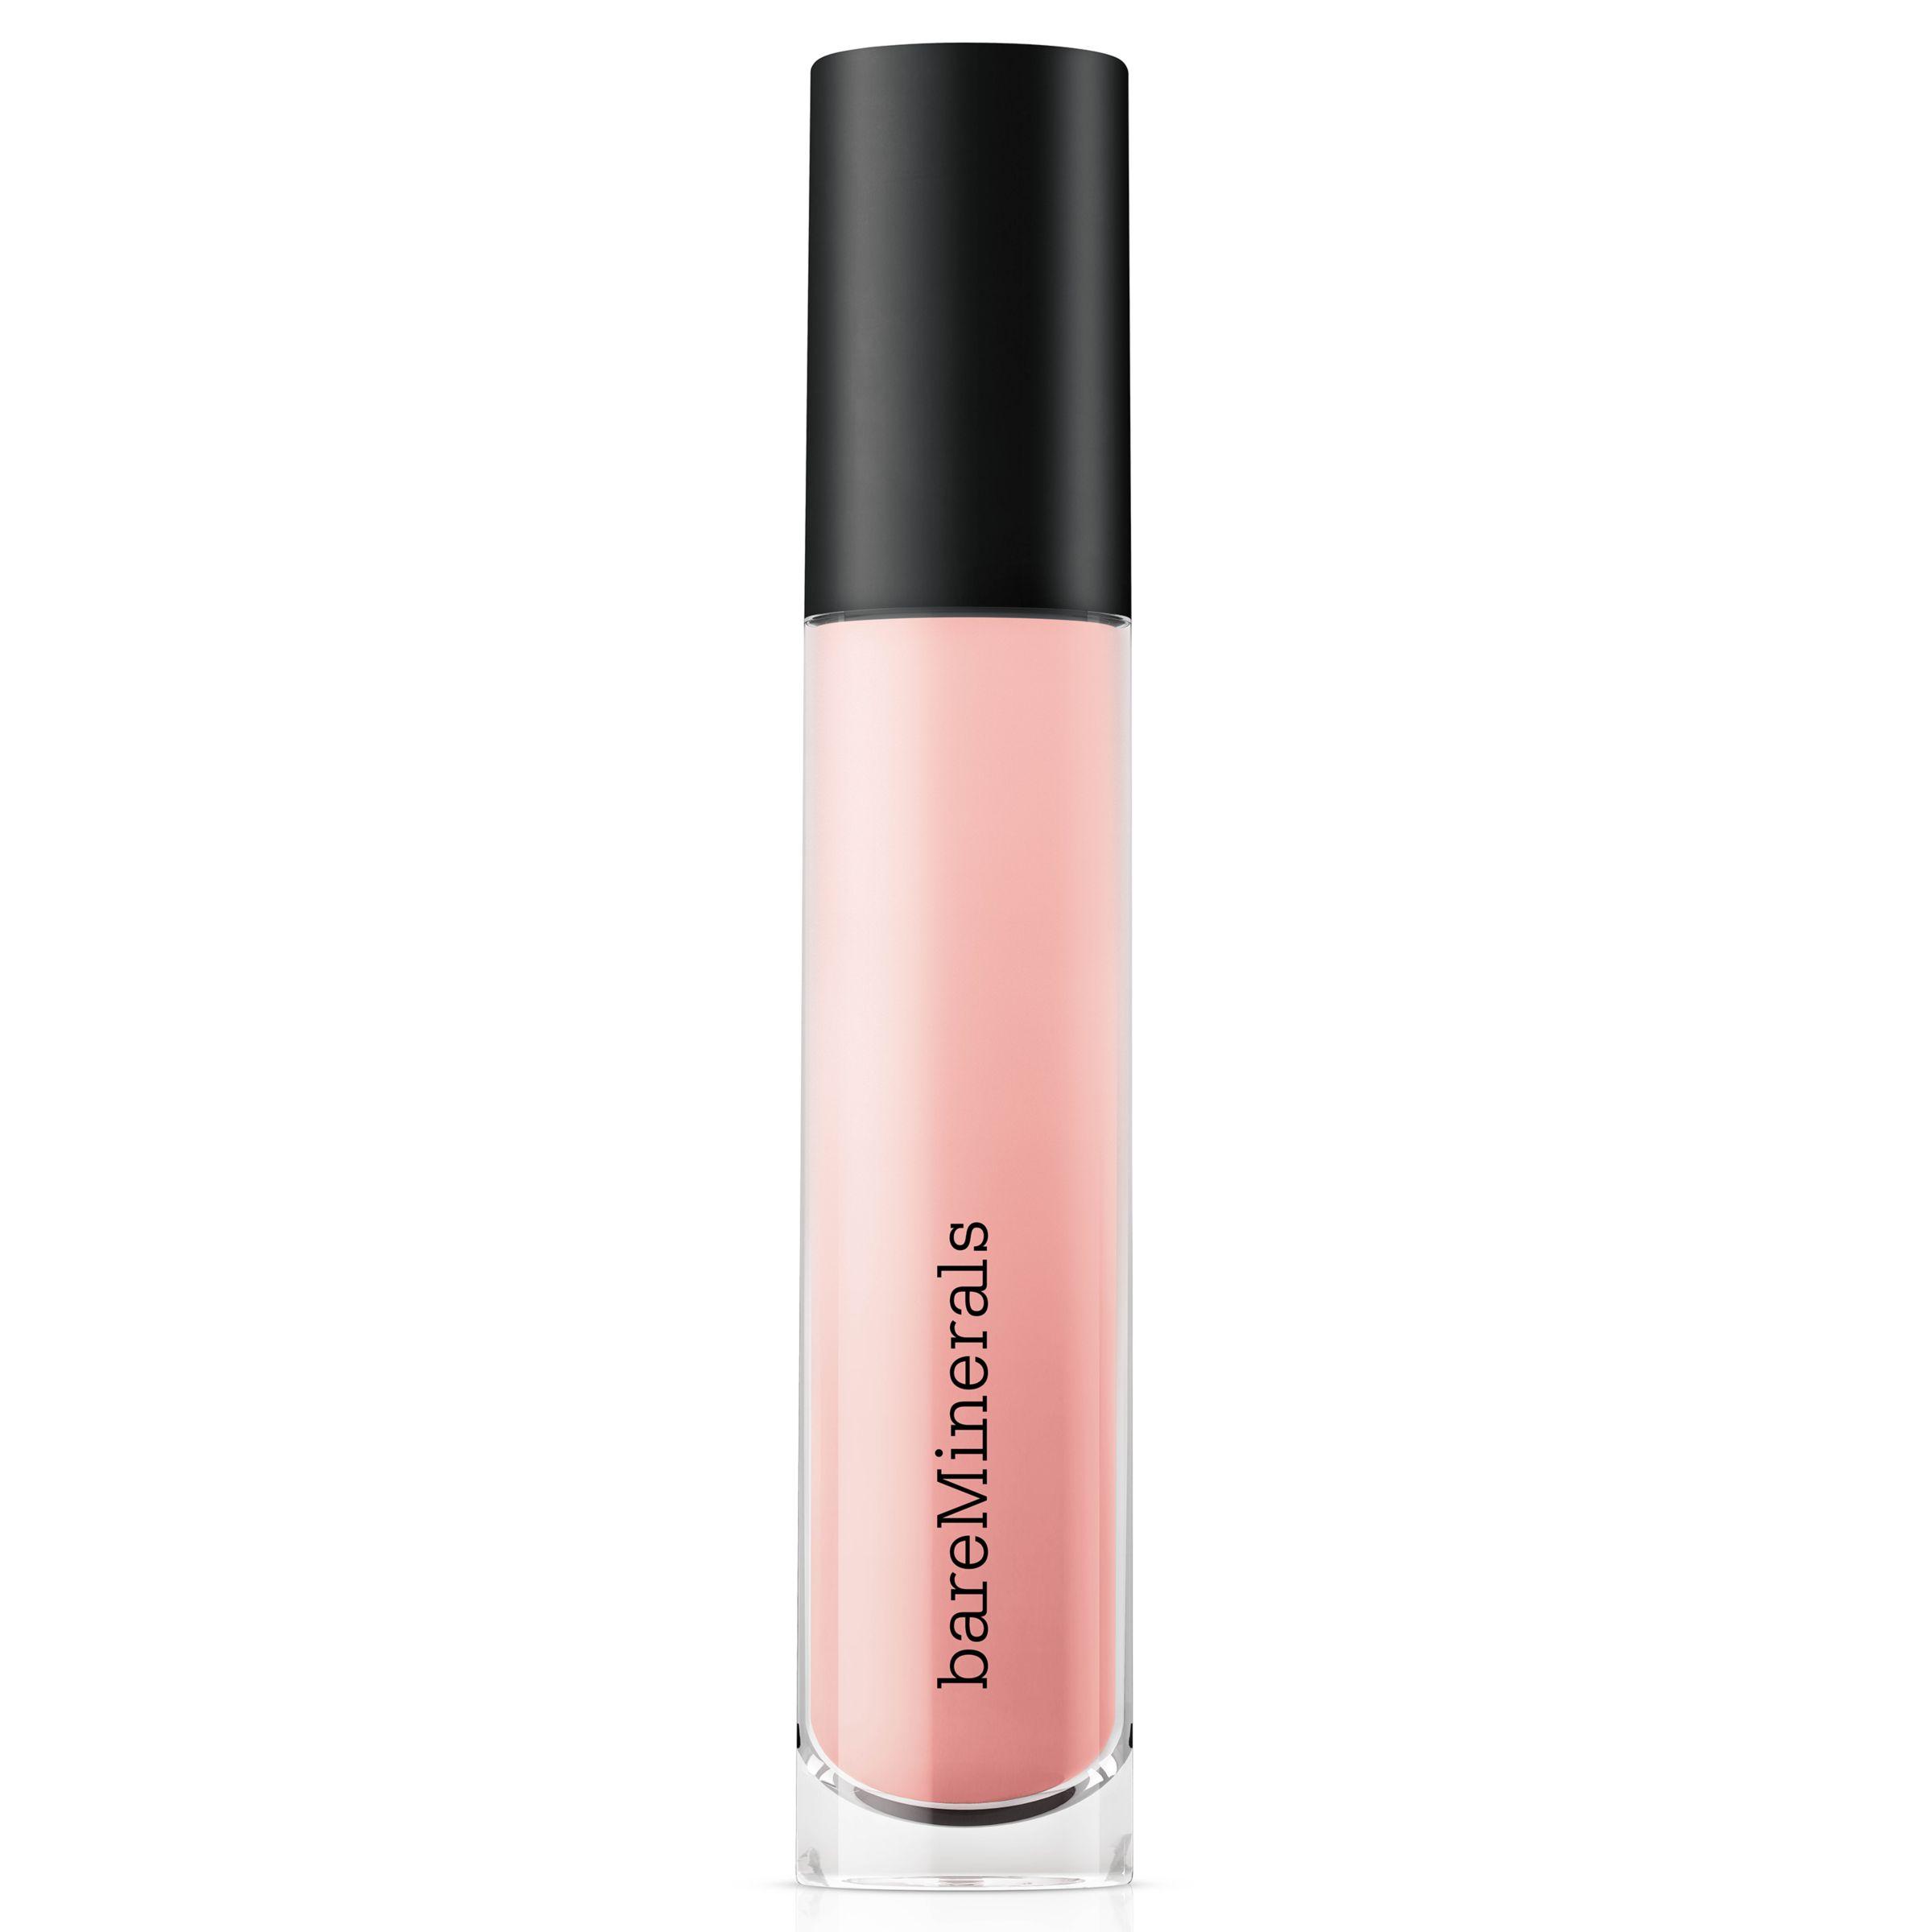 bareMinerals bareMinerals GEN NUDE™ Matte Liquid Lipcolour